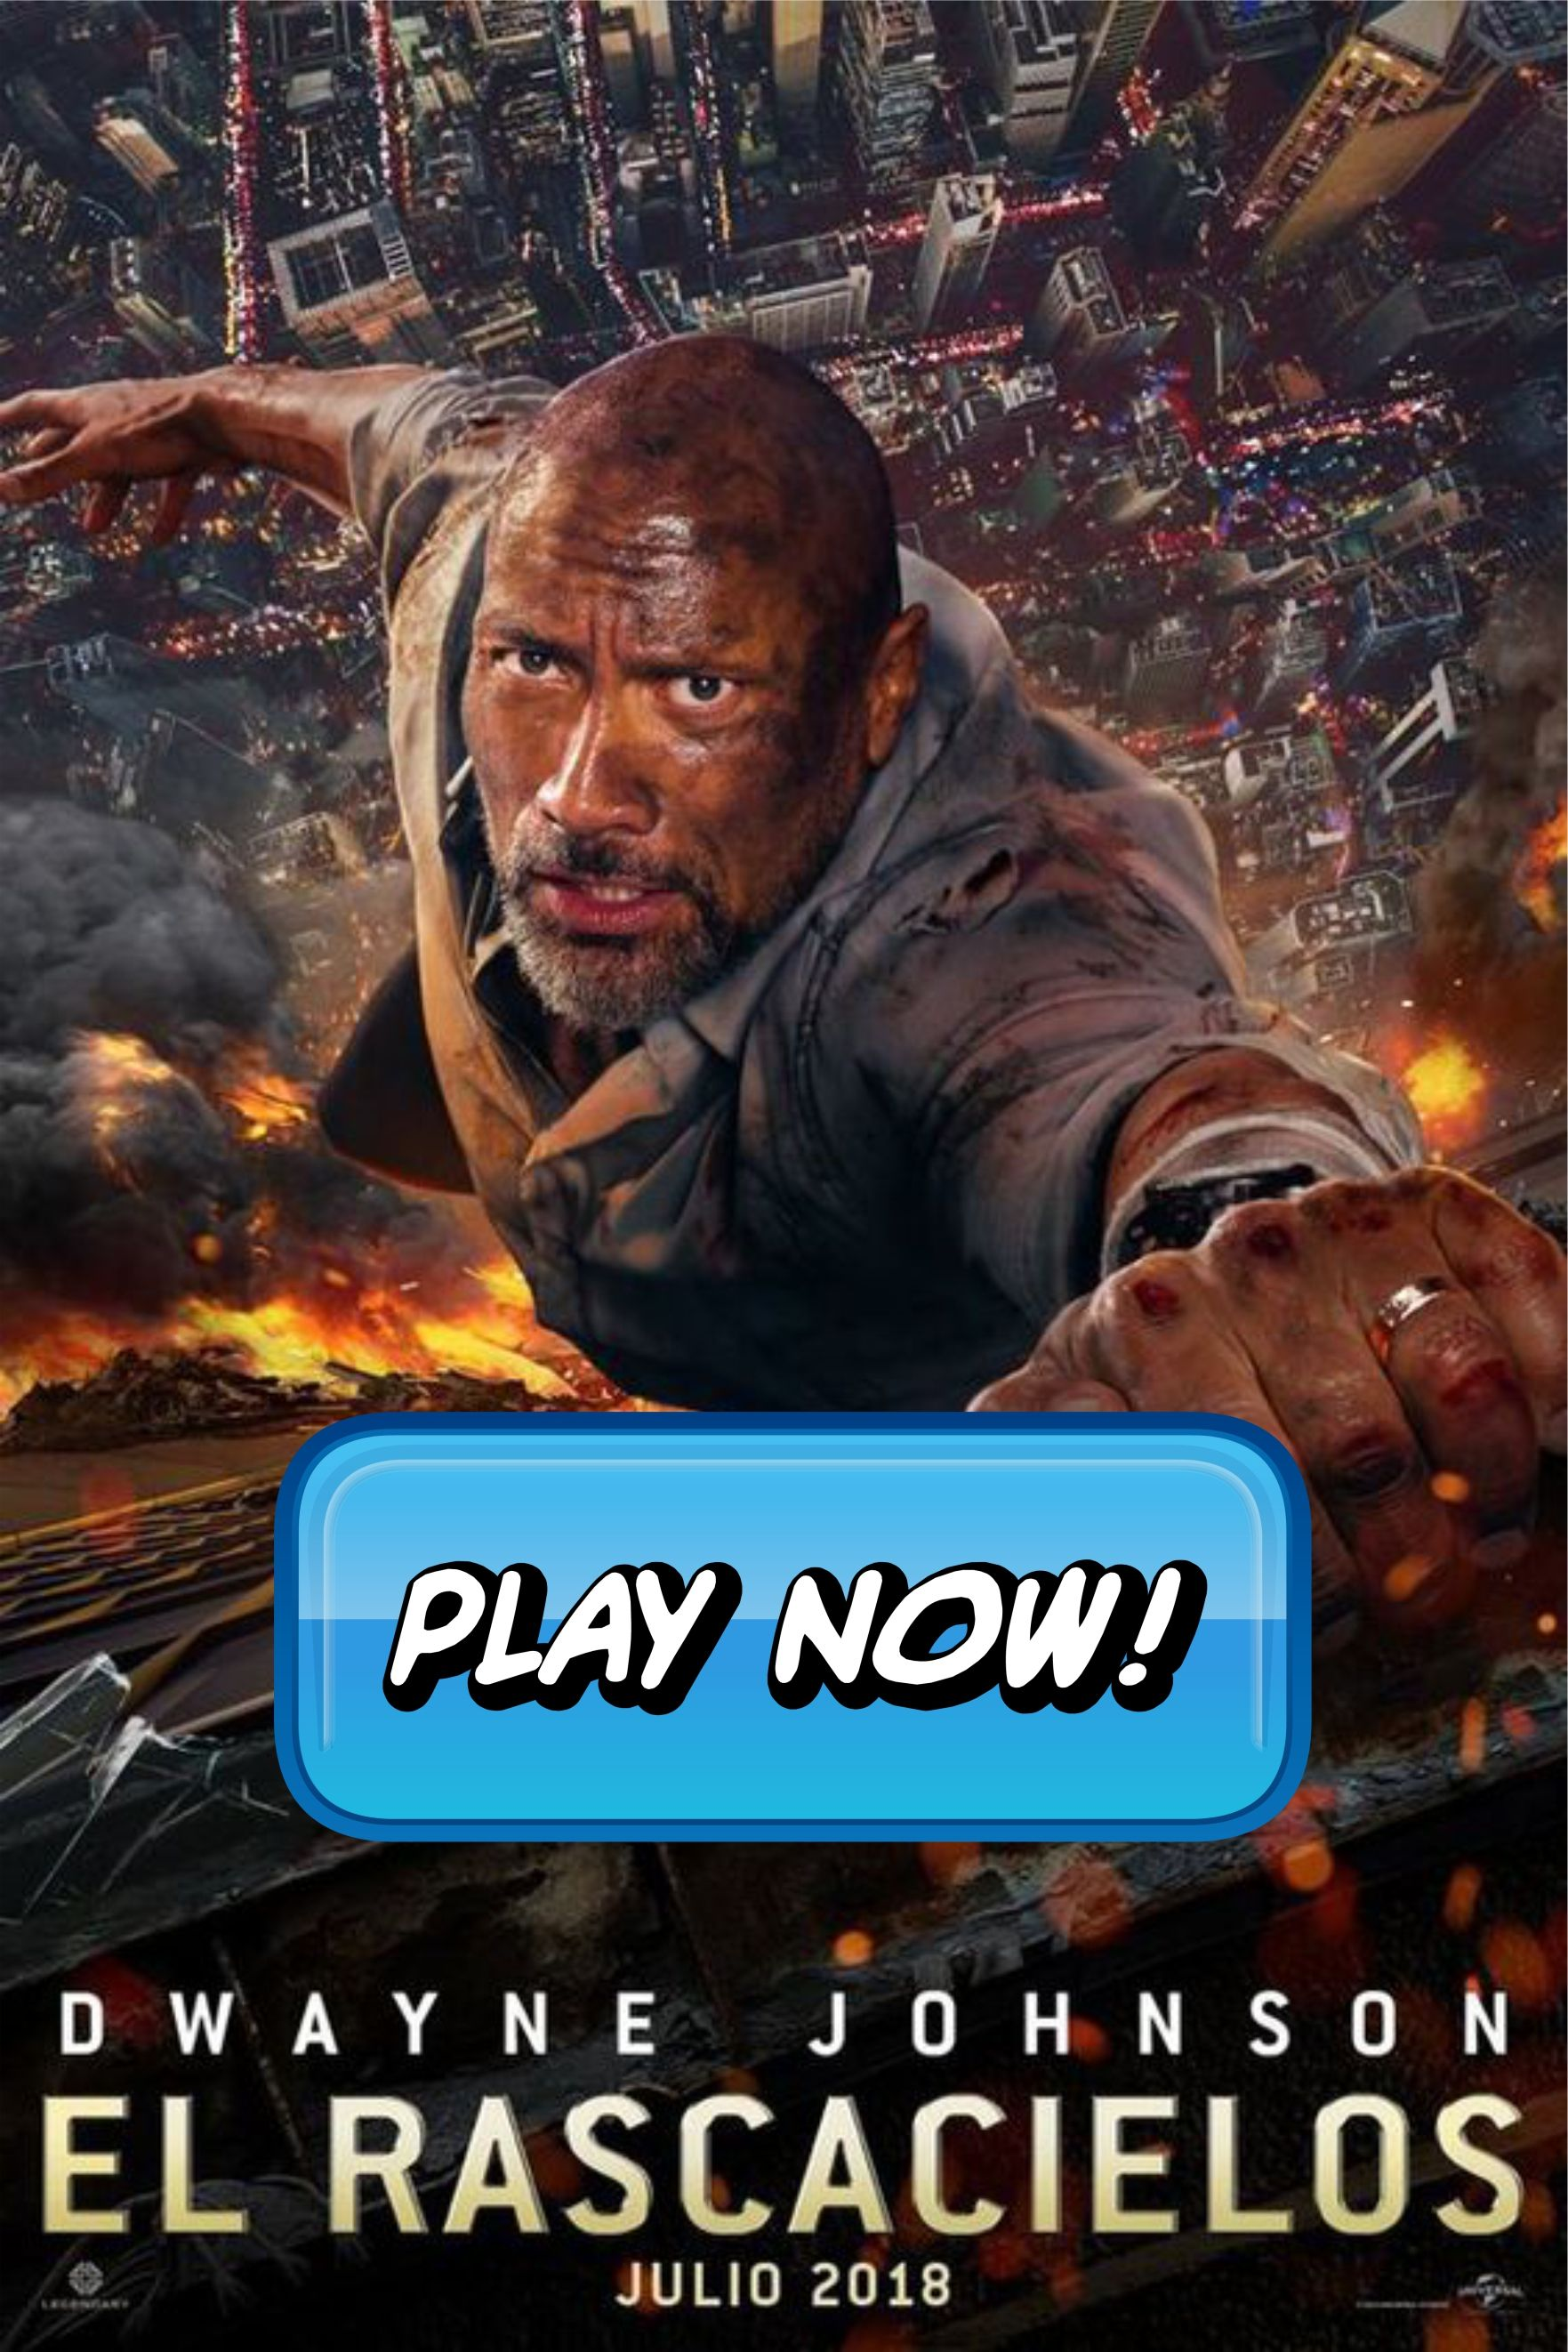 Ver El Rascacielos 2018 Online Español Pelicula Hd Completa Full Movies Free Movies Online Watch Free Movies Online